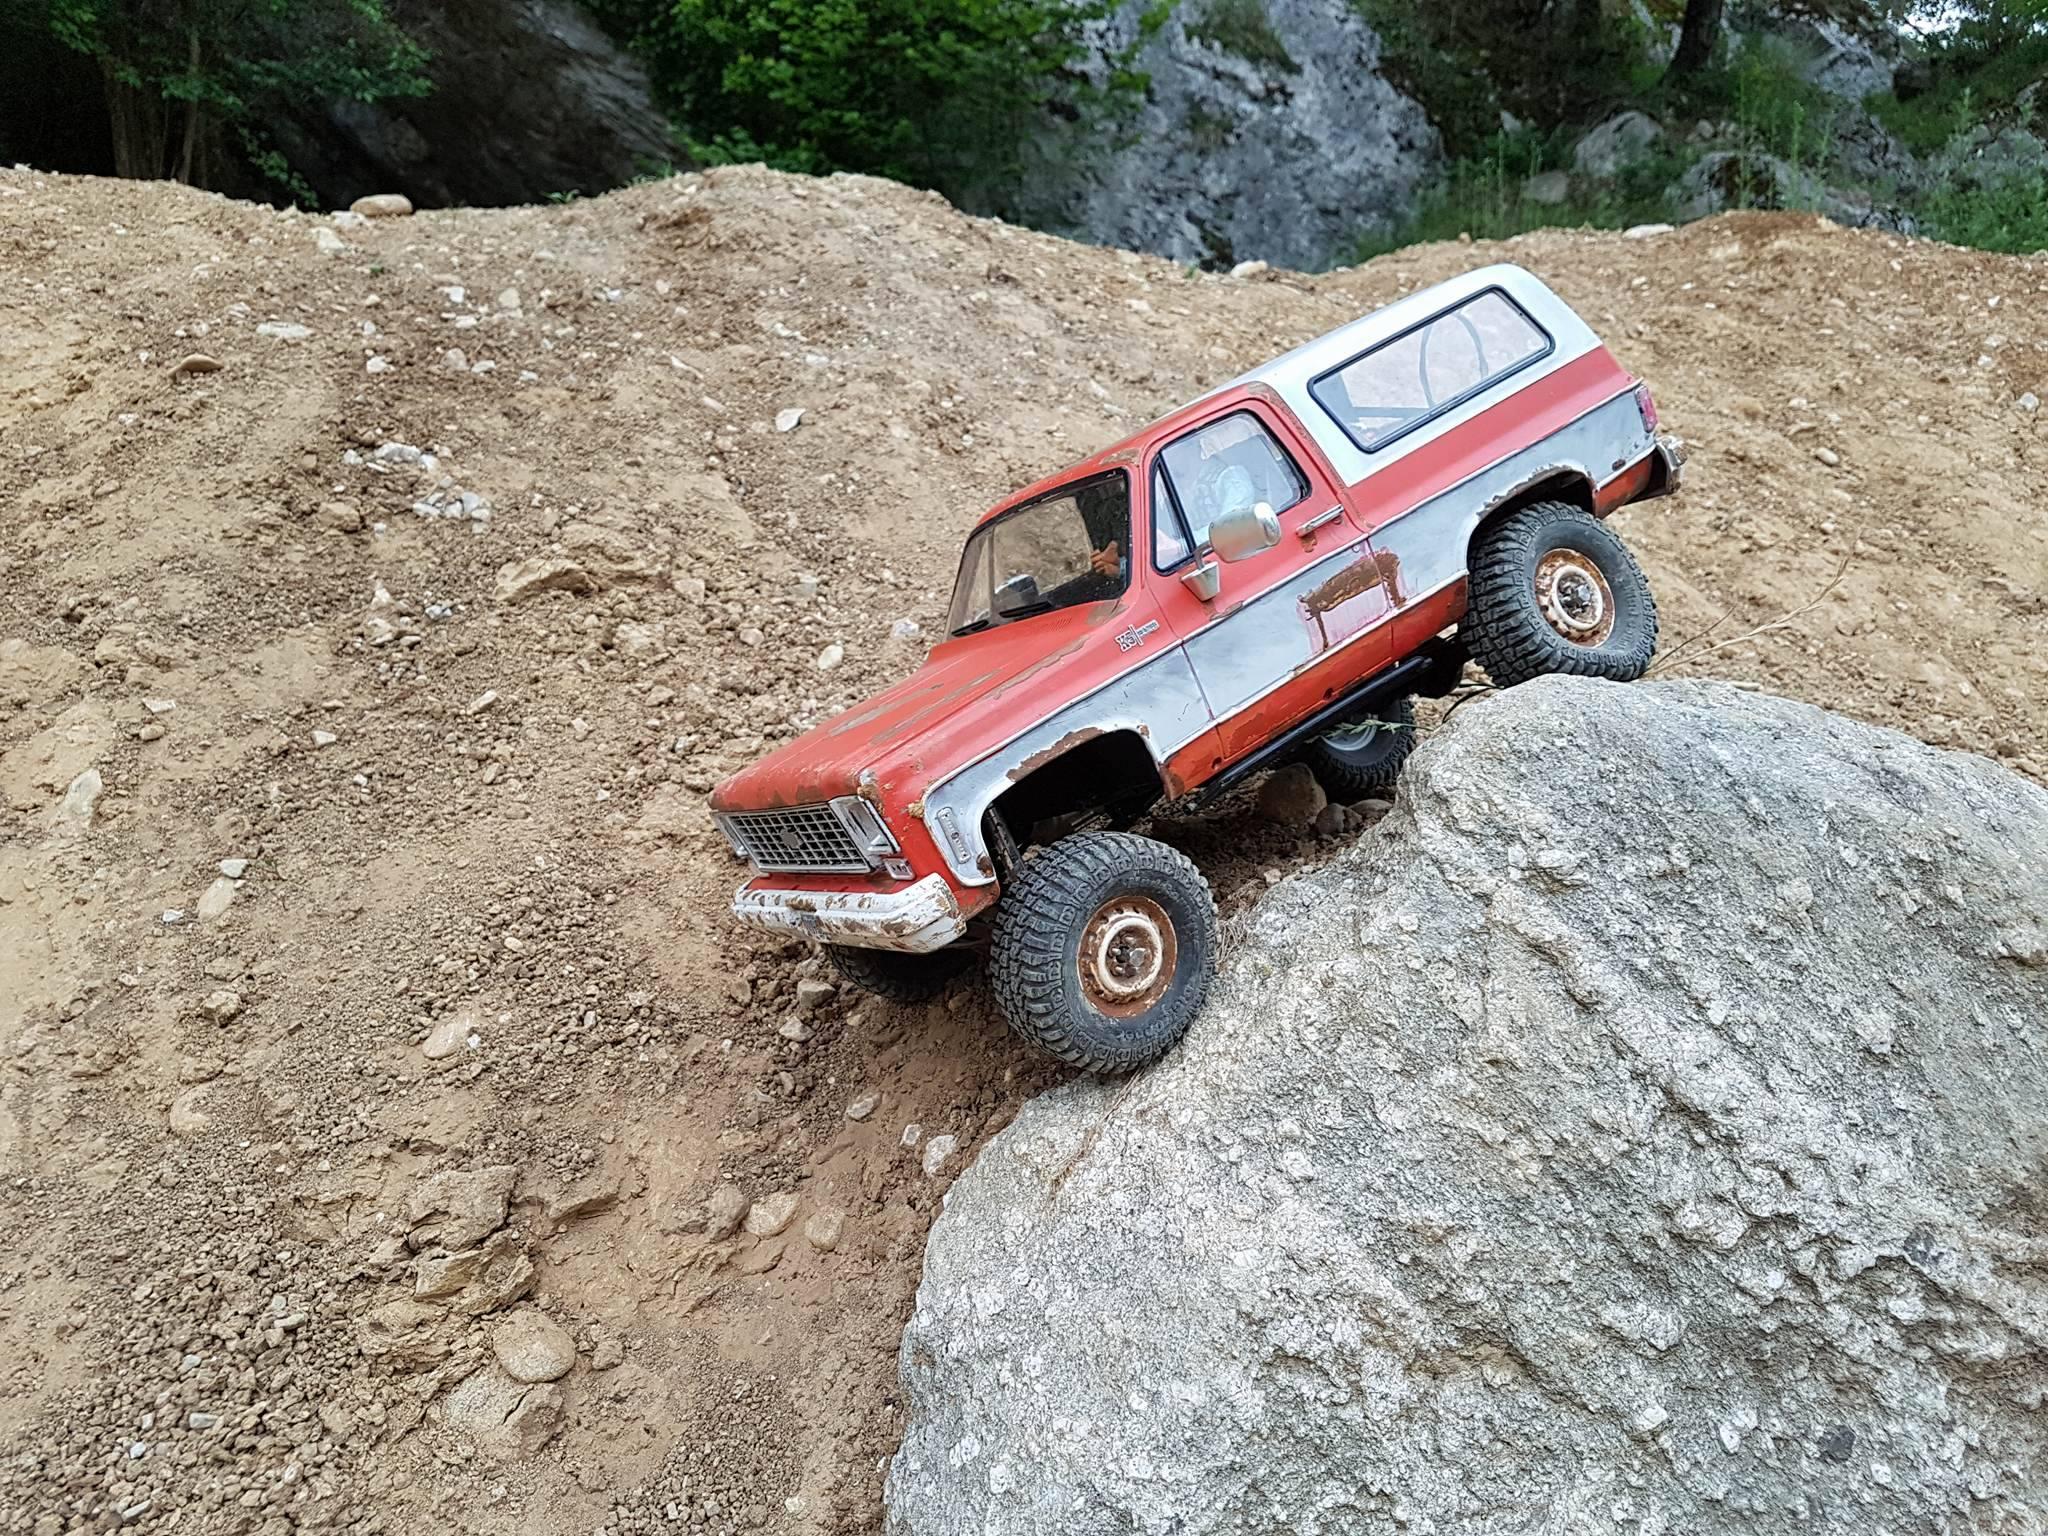 Farm Truck Chevrolet Blazer K5 sur TF2, Road Trip ! - Page 3 690158194007631303432139775326329317104o